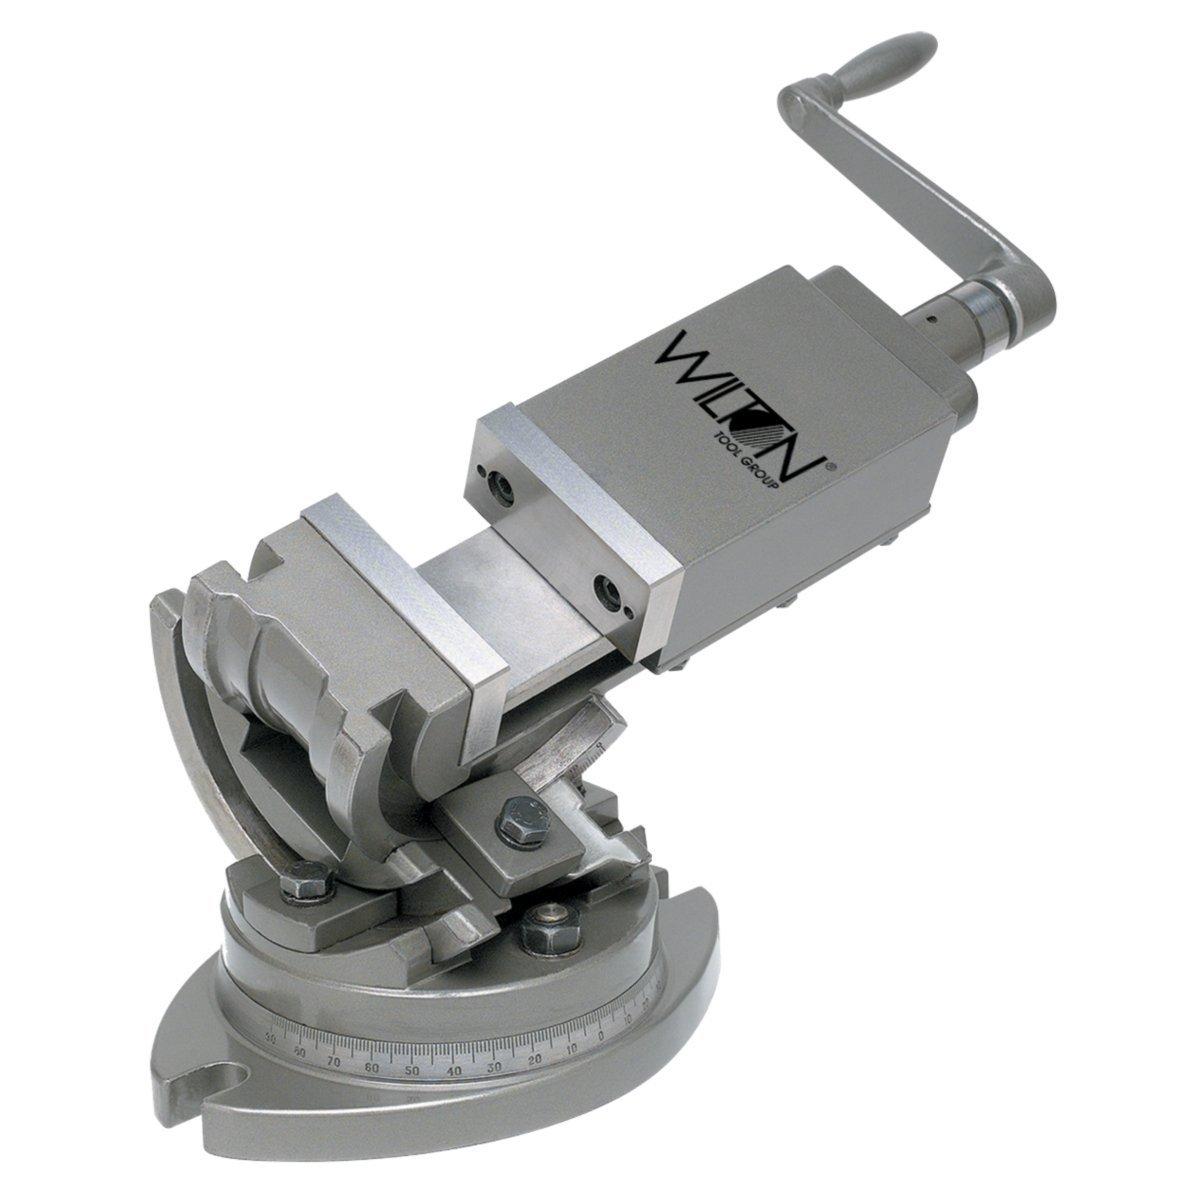 Proxxon 28608 Precision Vise FMZ with Clamp